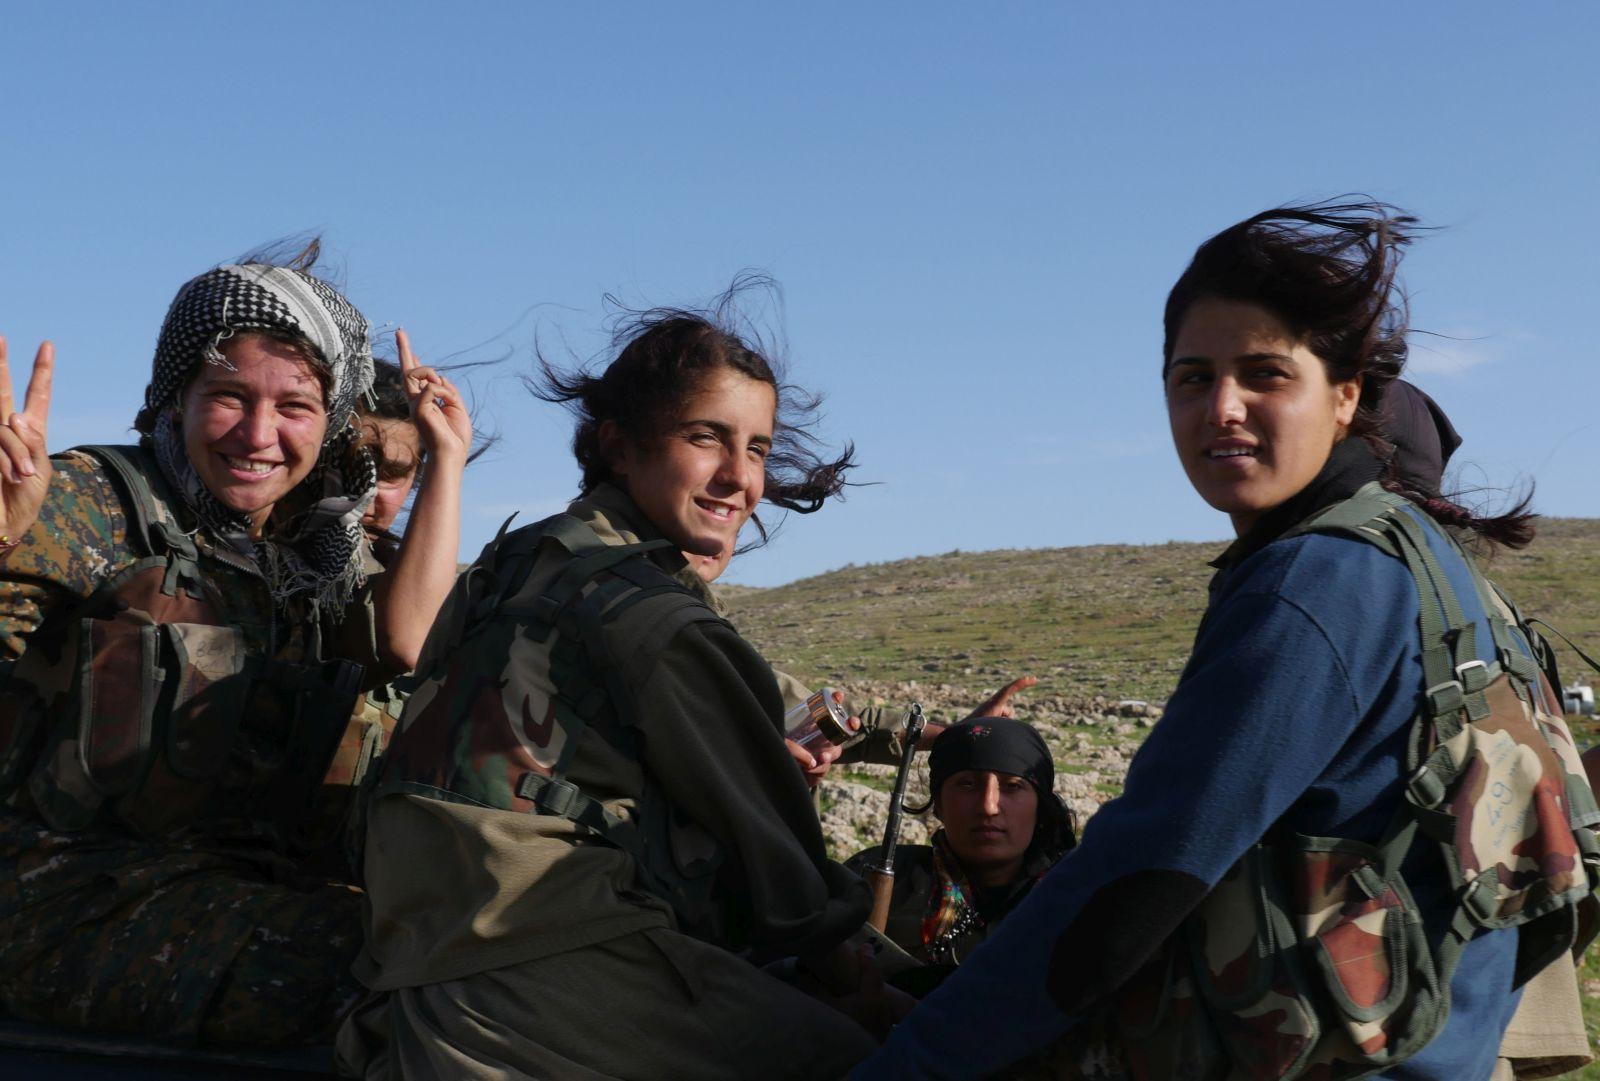 Some kurds guerrilla women in Sinjar